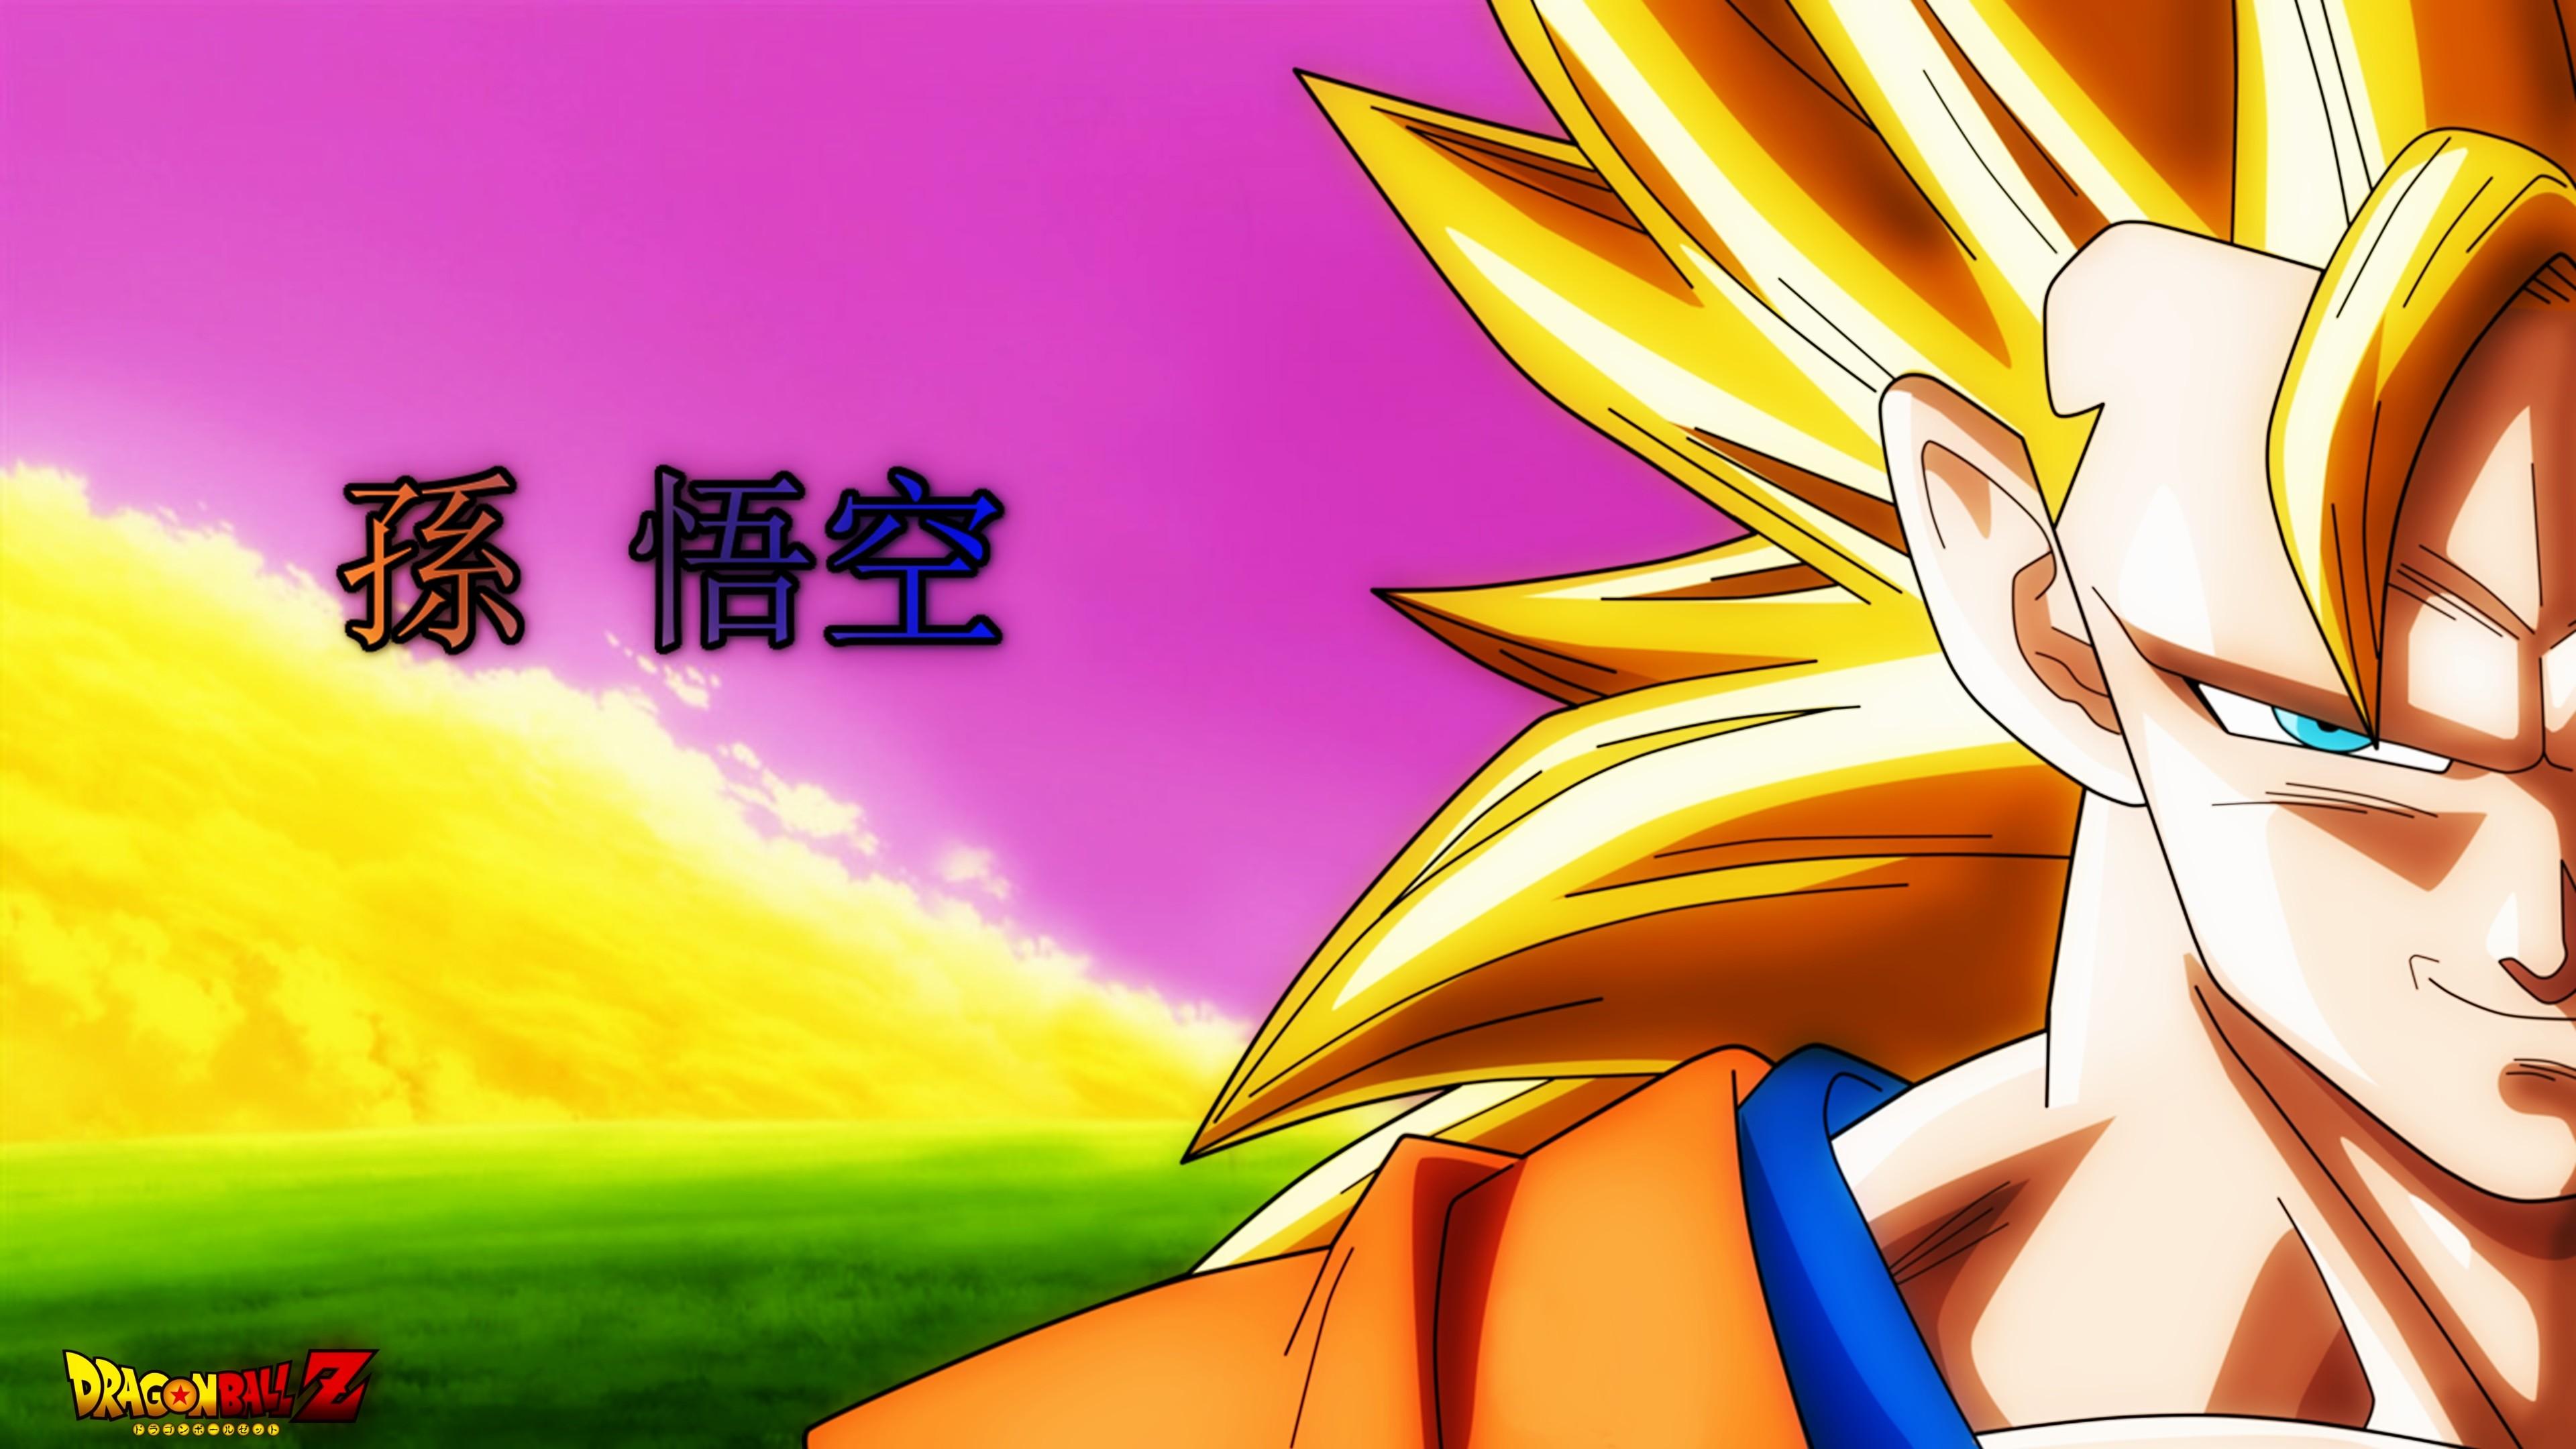 1920x1080 Ssj4 Goku Wallpaper